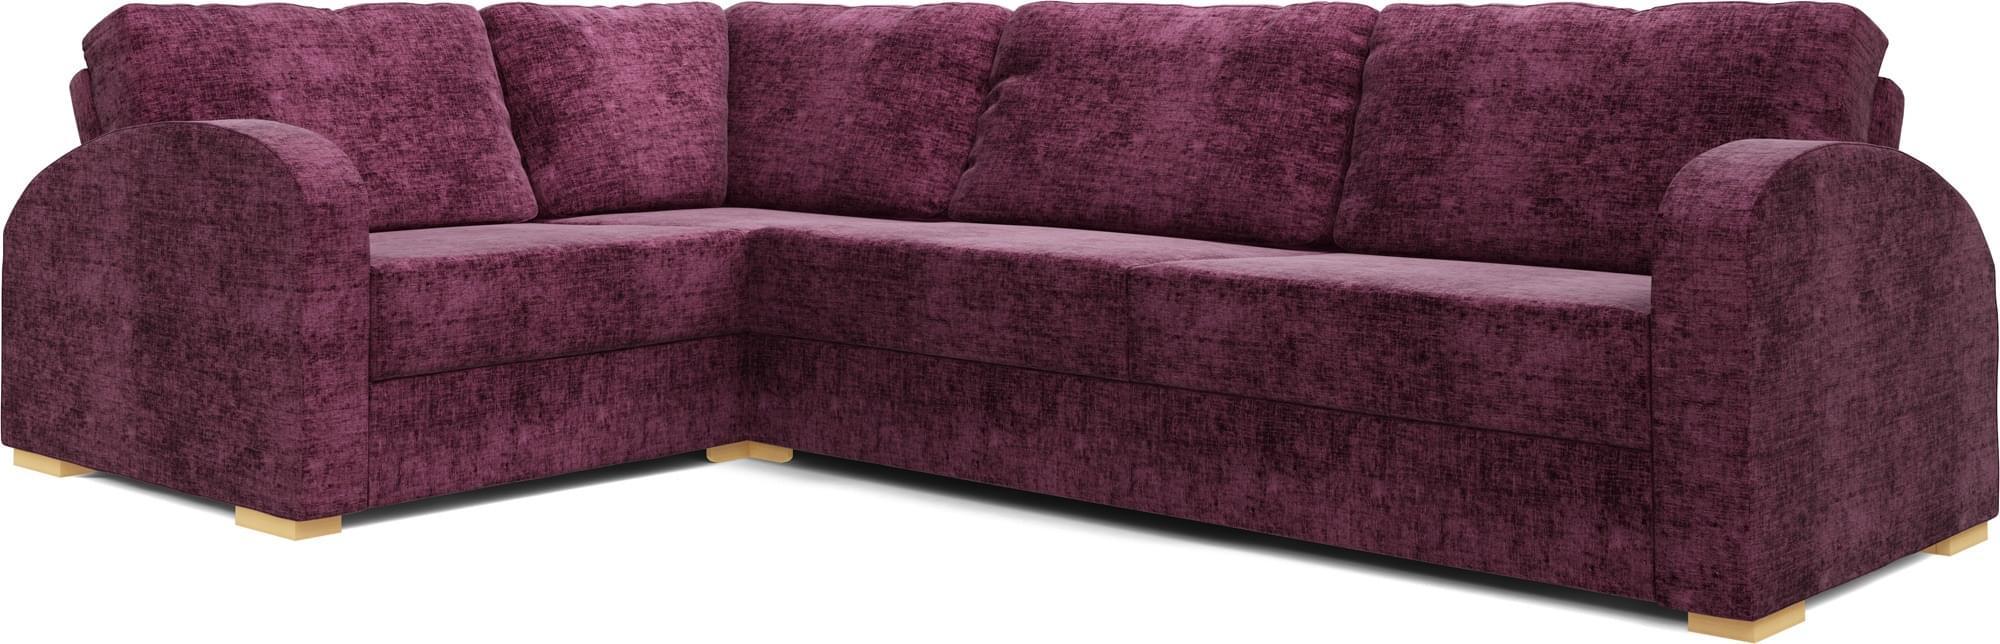 Kurv 3X2 Corner Sofa